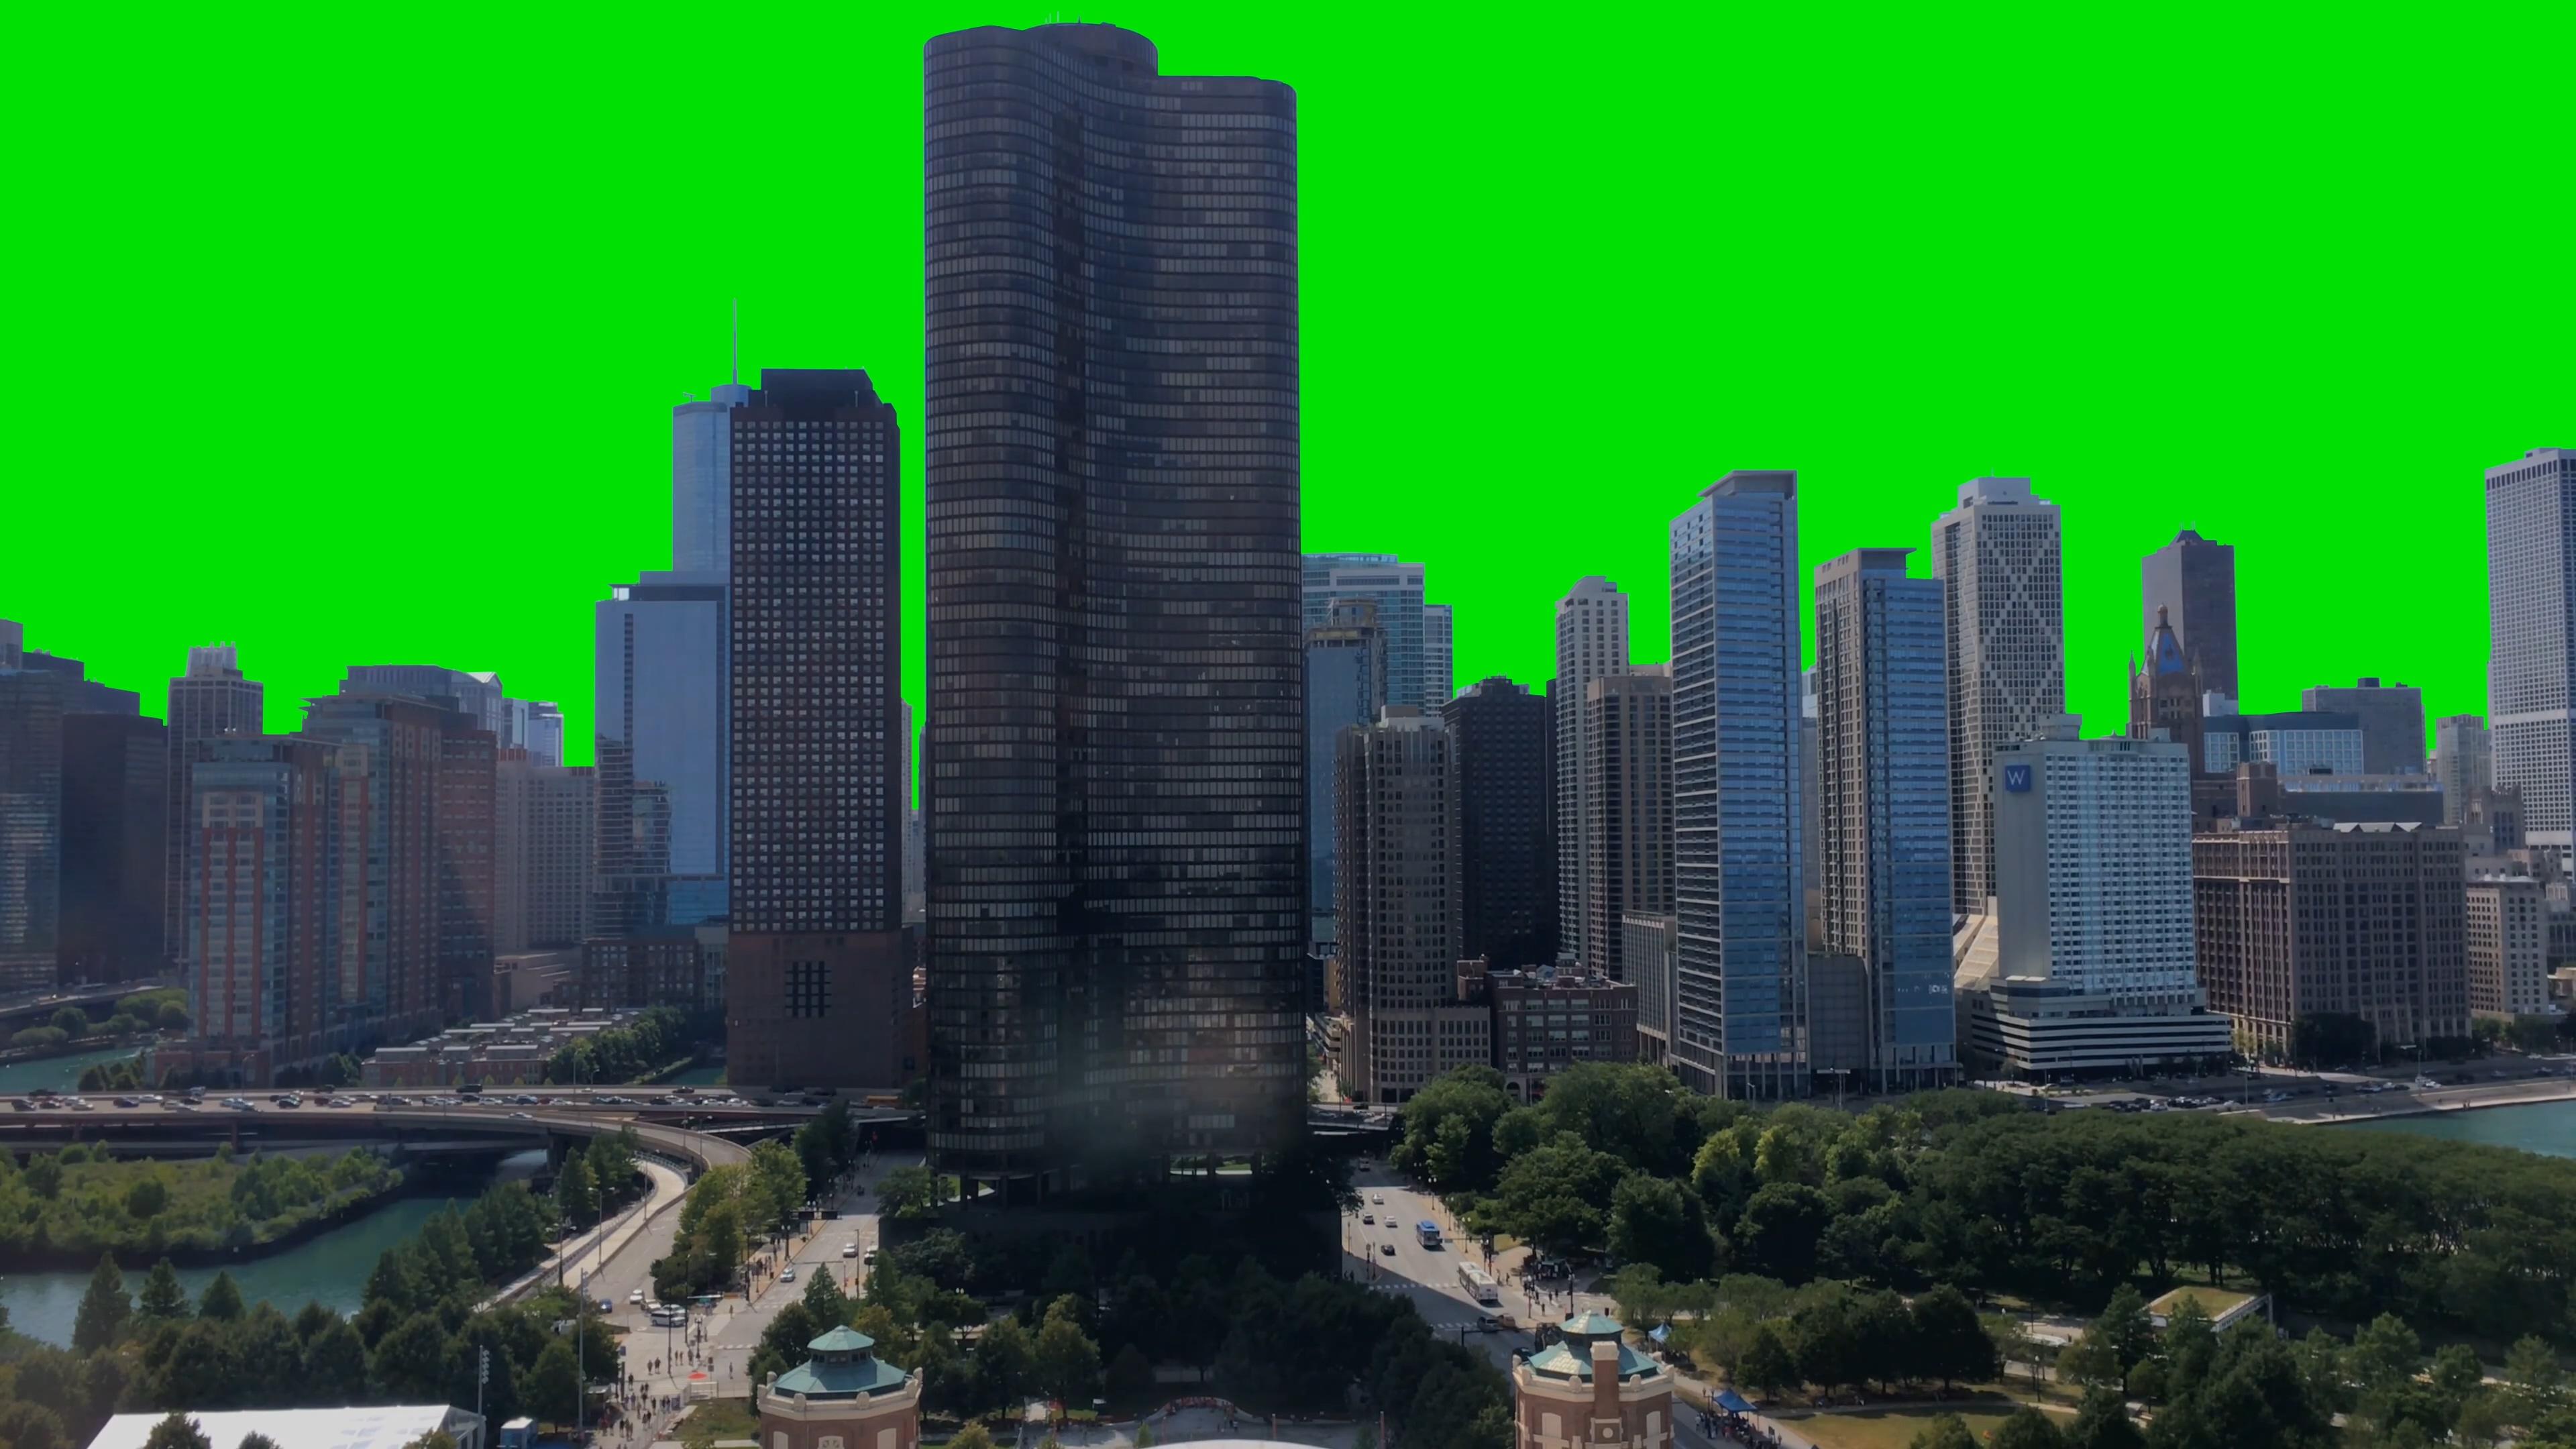 \[4K\]绿屏抠像城市高楼大厦建筑